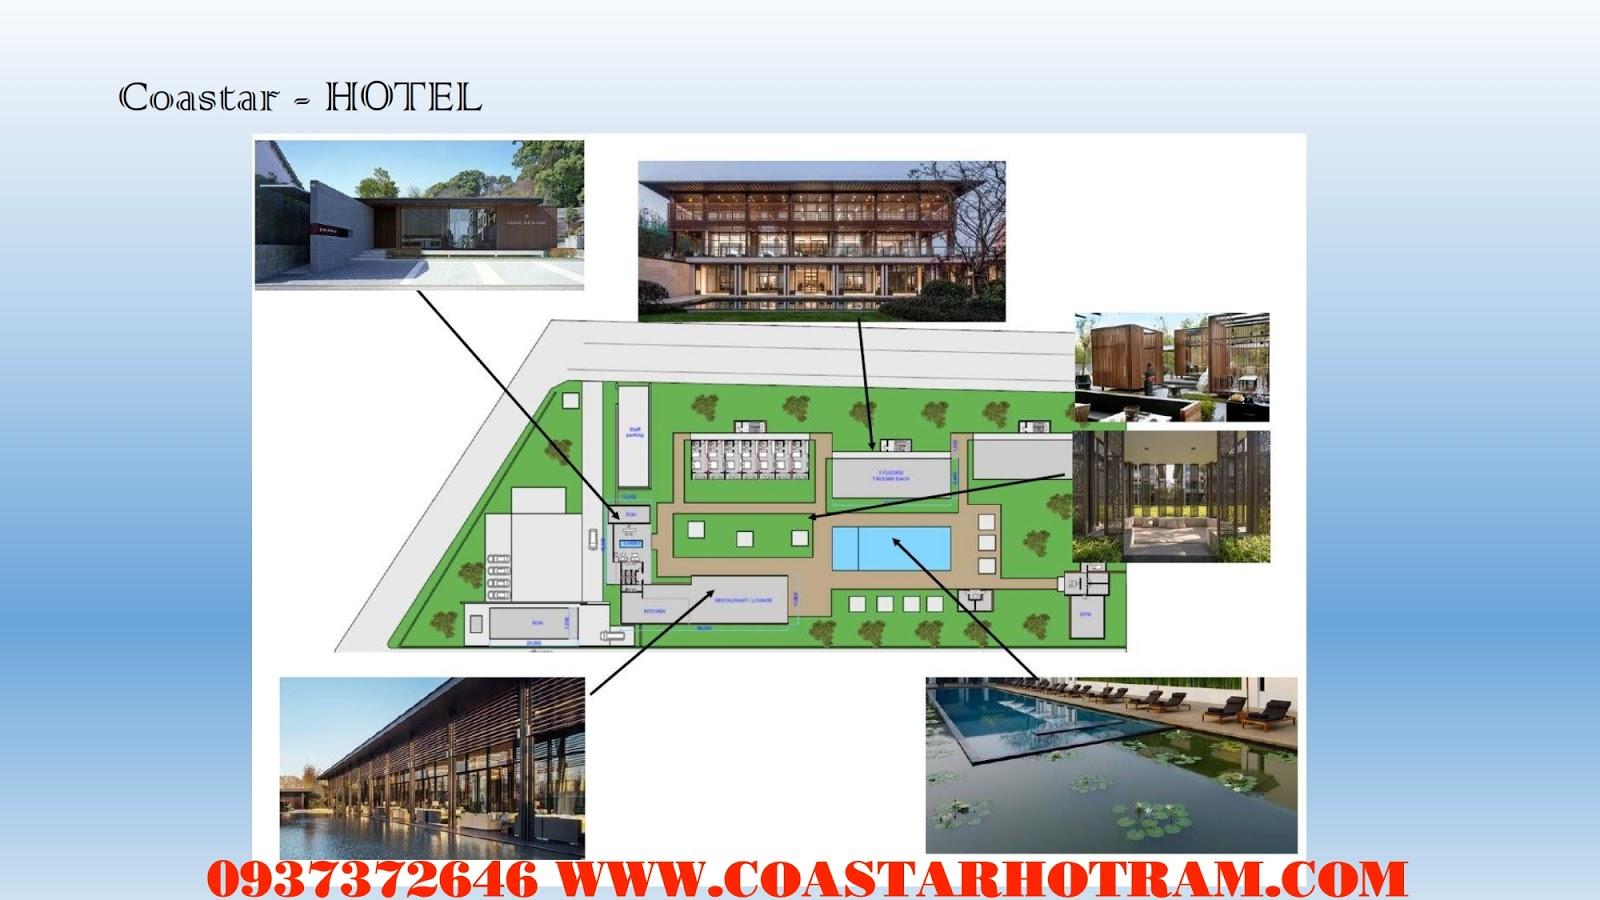 COASTARHOTRAM.COM